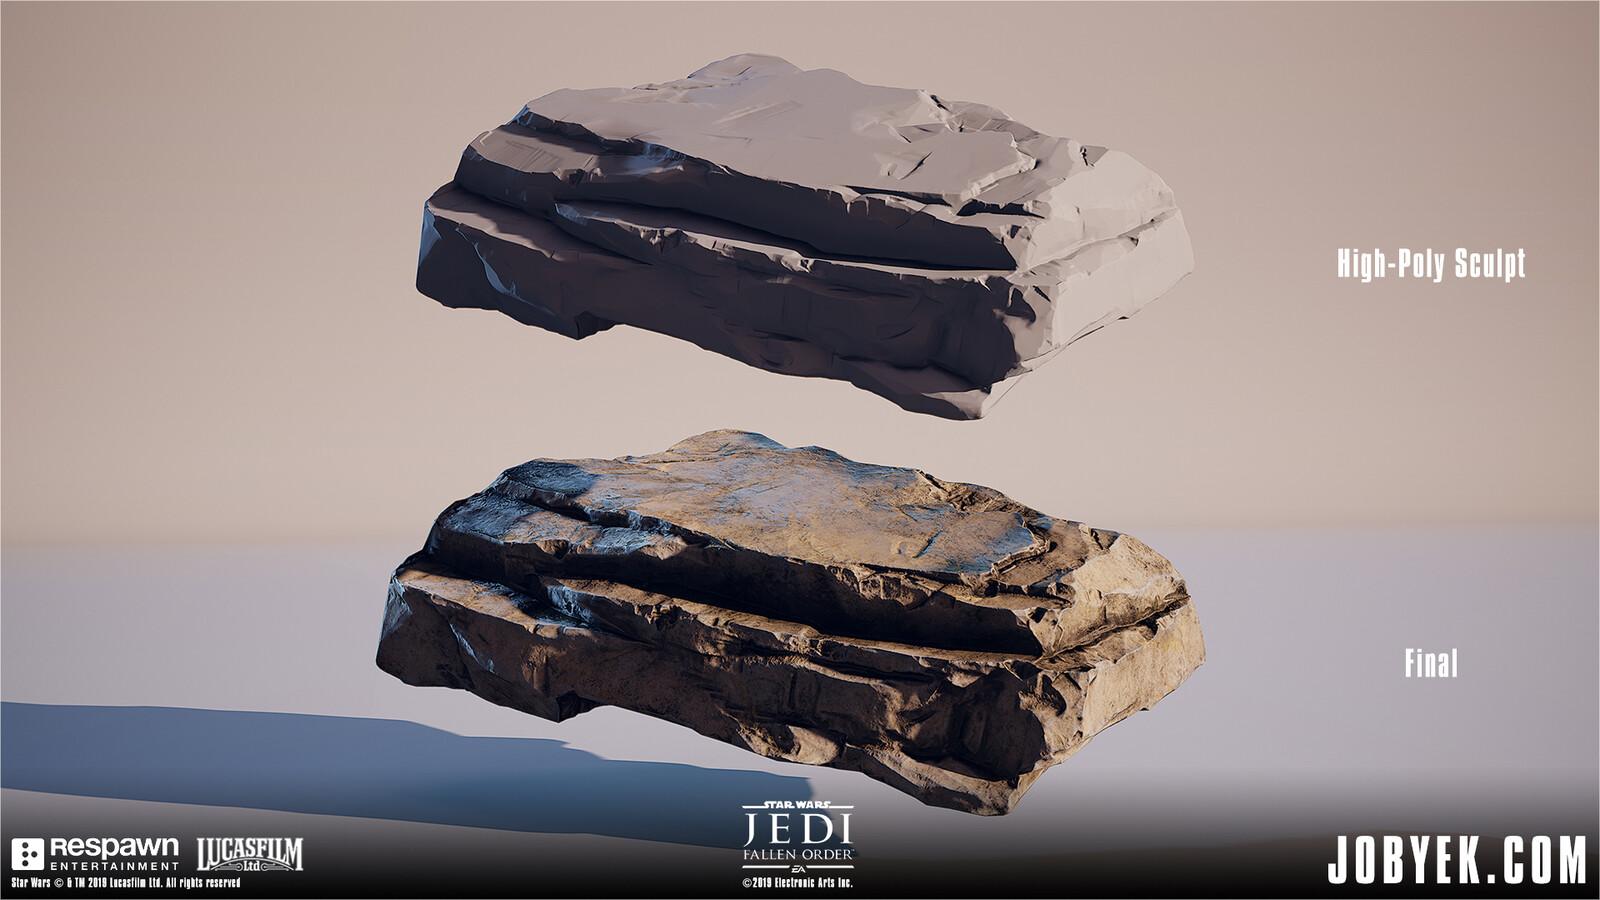 Sculpted & textured these mid-range vista rocks (never get up close)